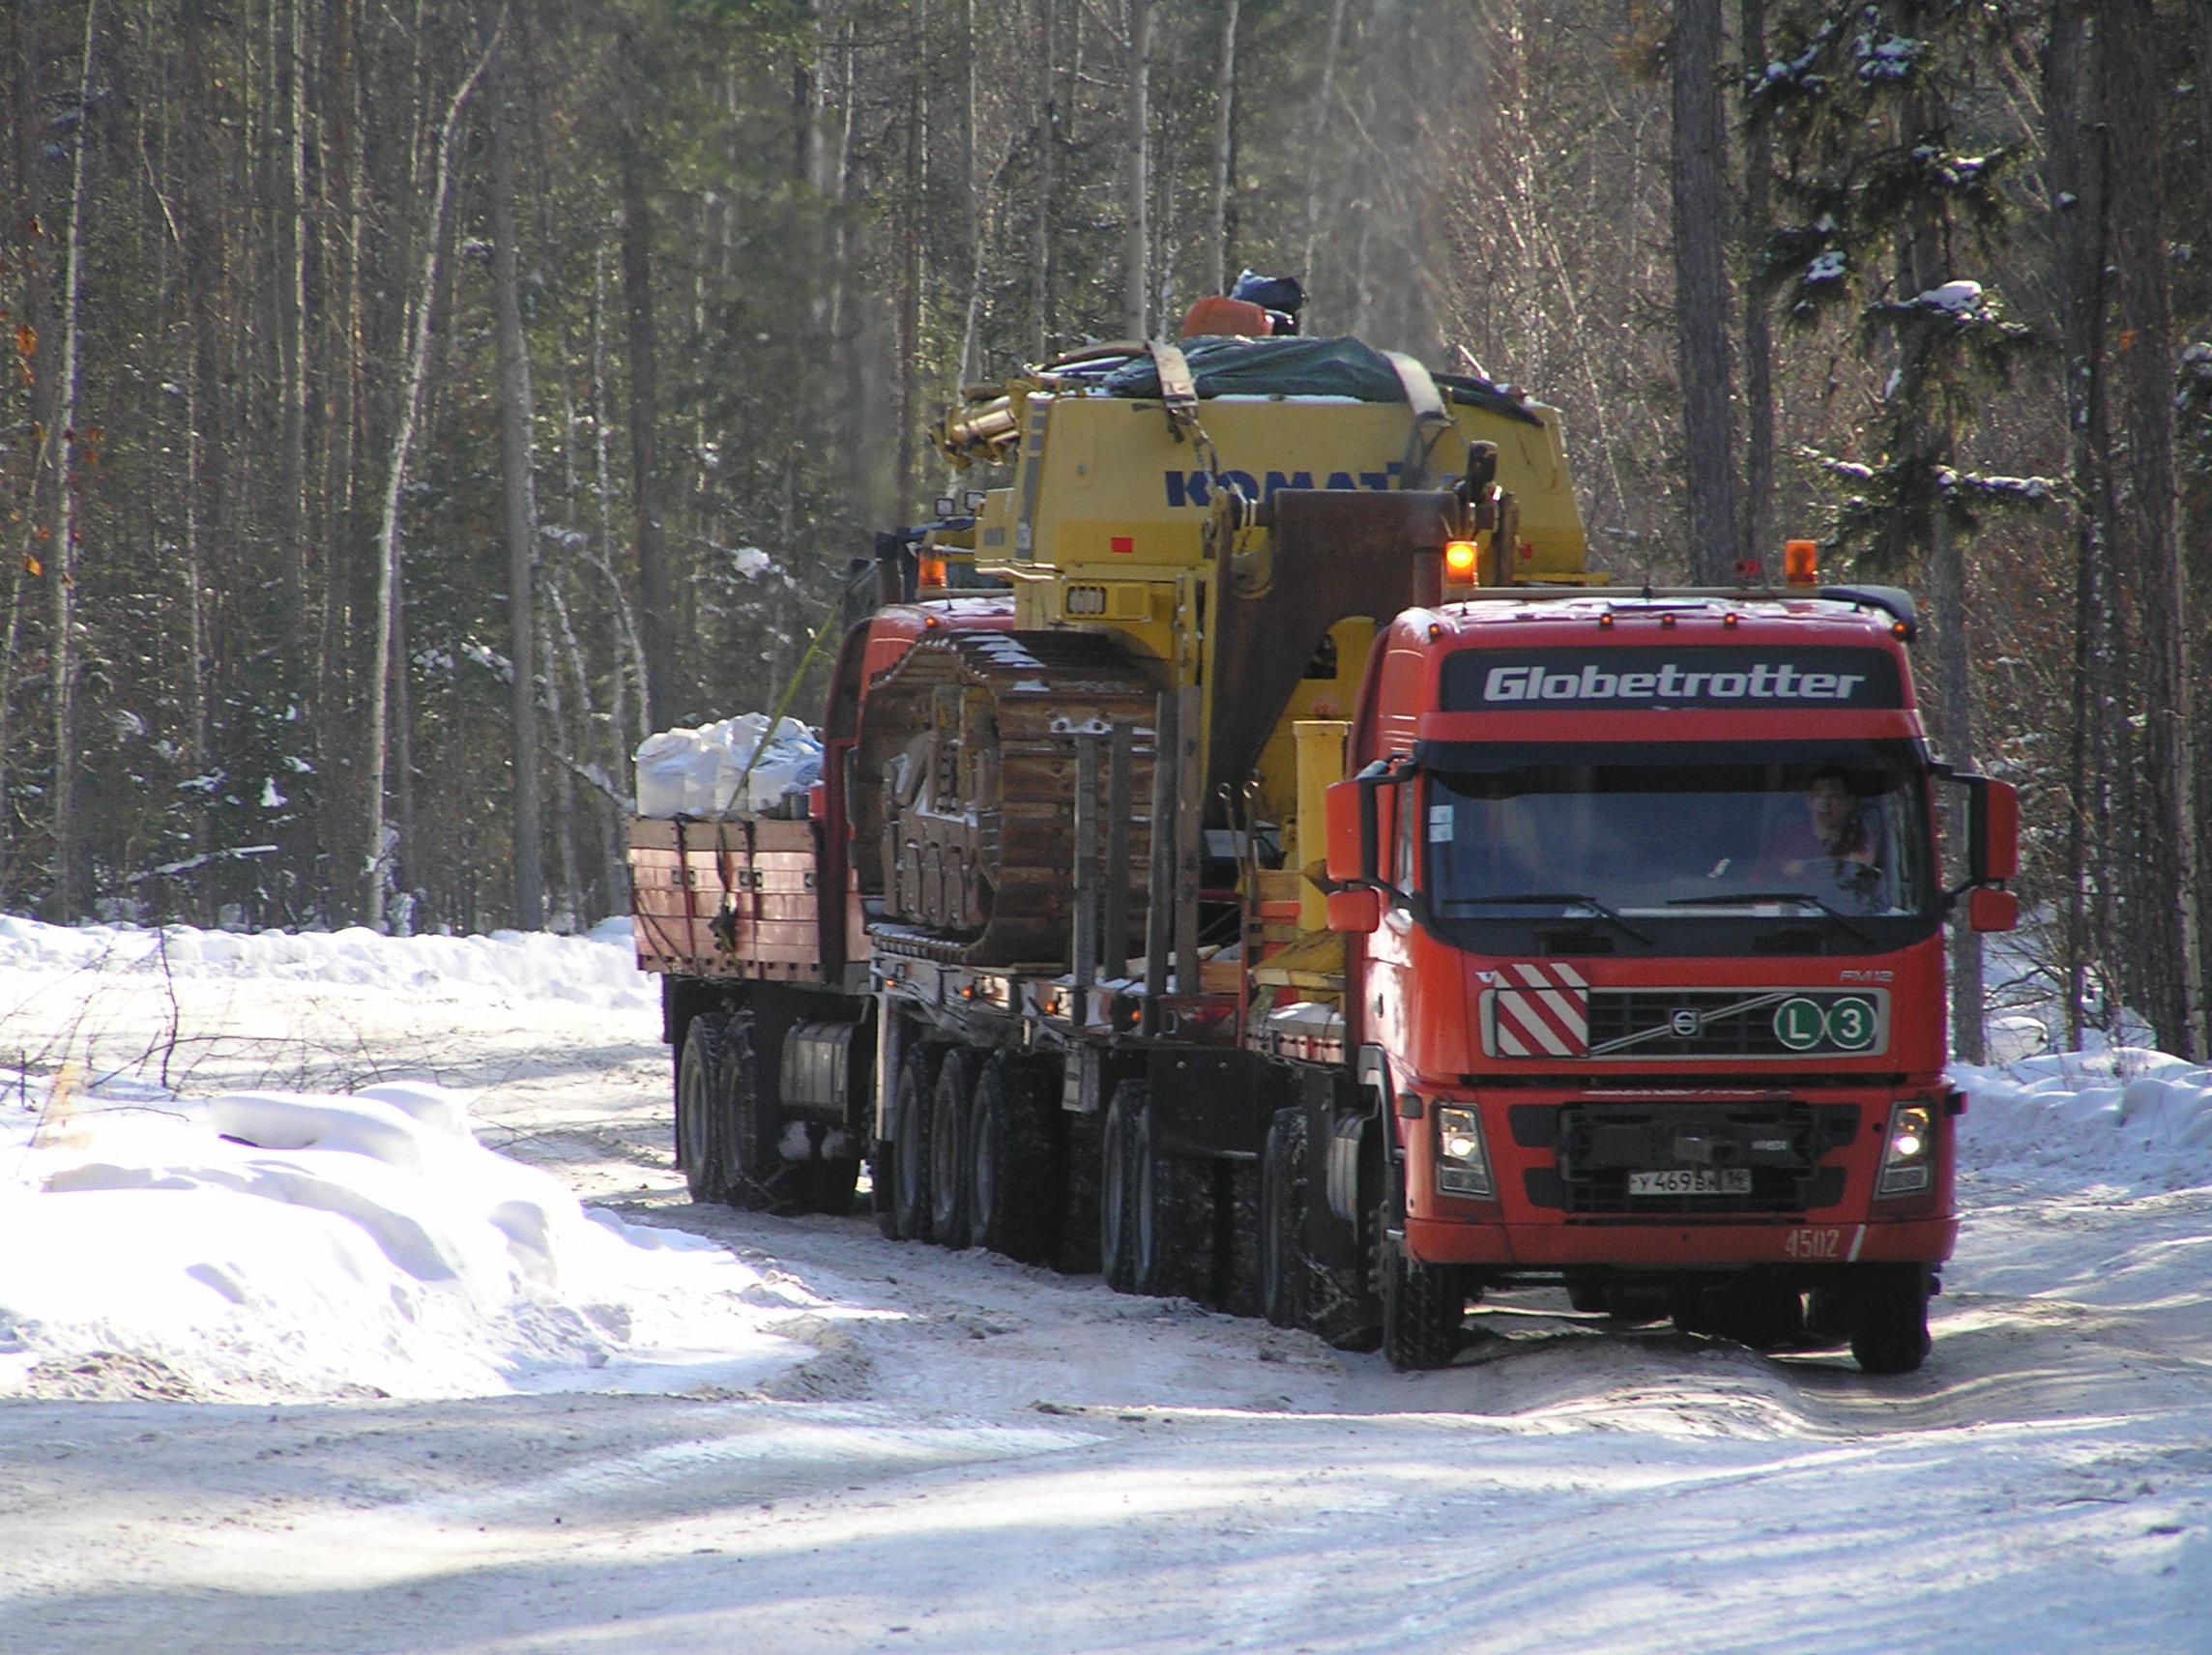 АЛРОСА обновила свыше 470 единиц техники и оборудования